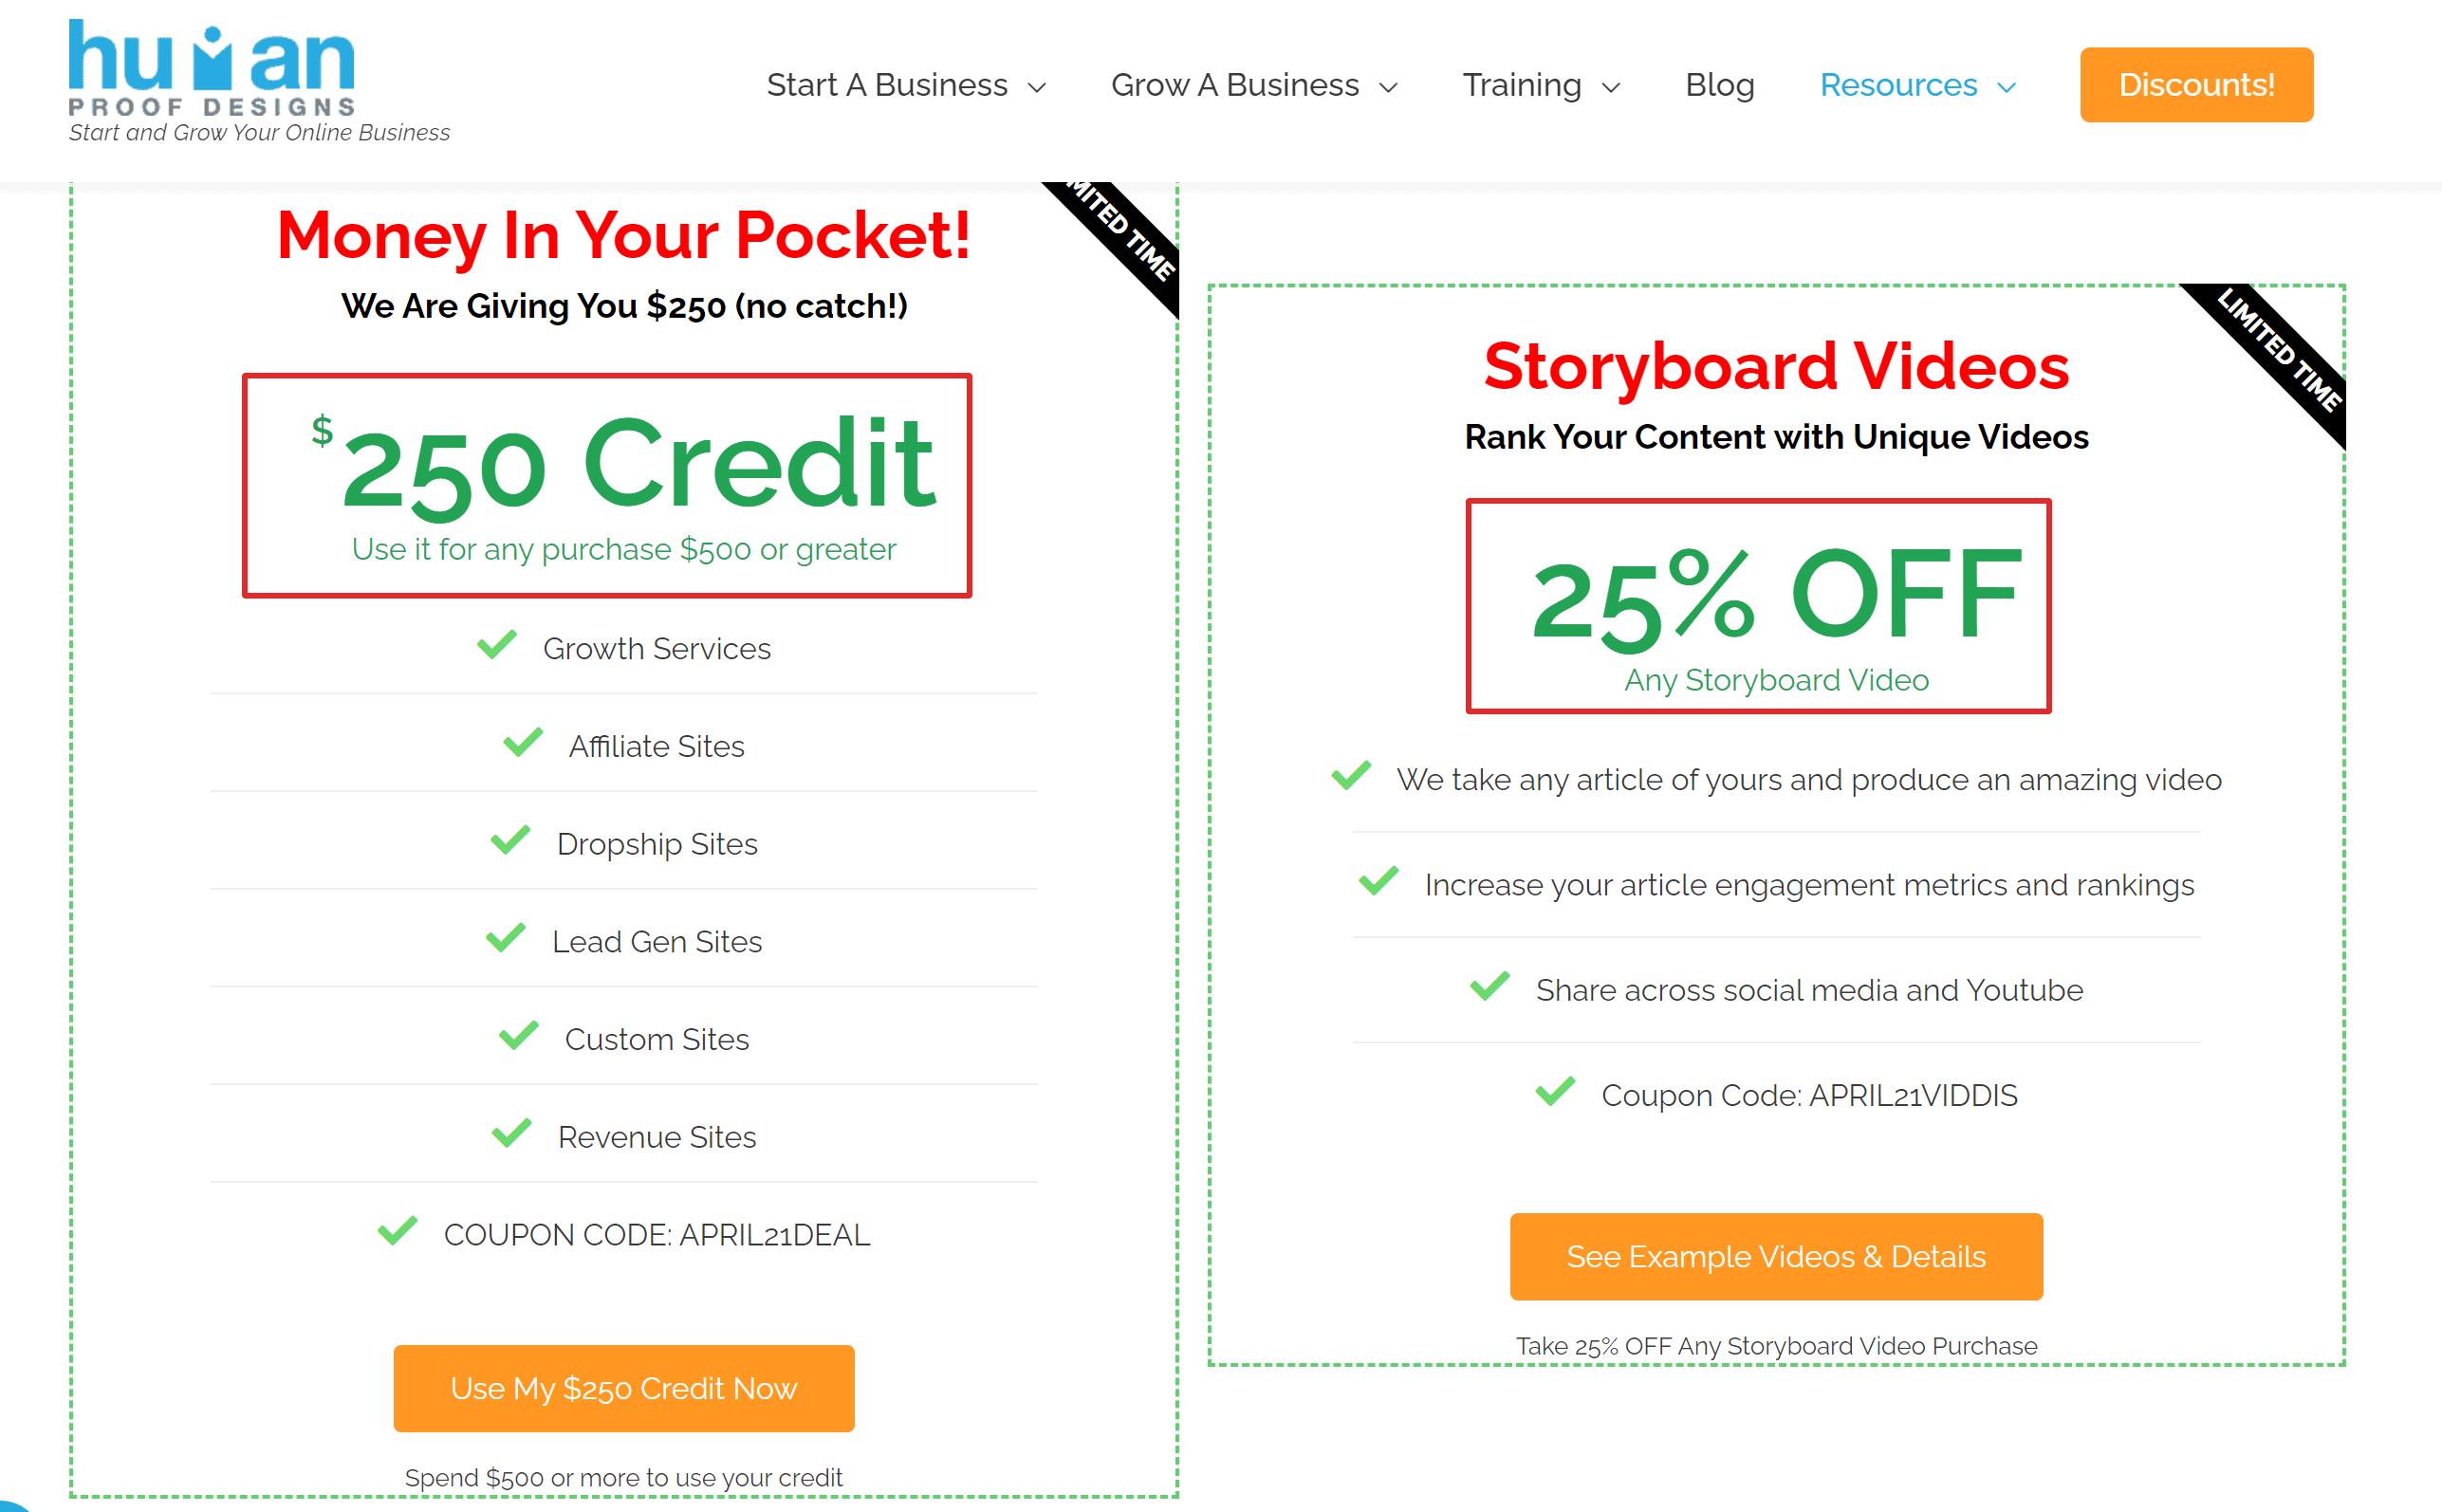 Human Proof Designs Free credit